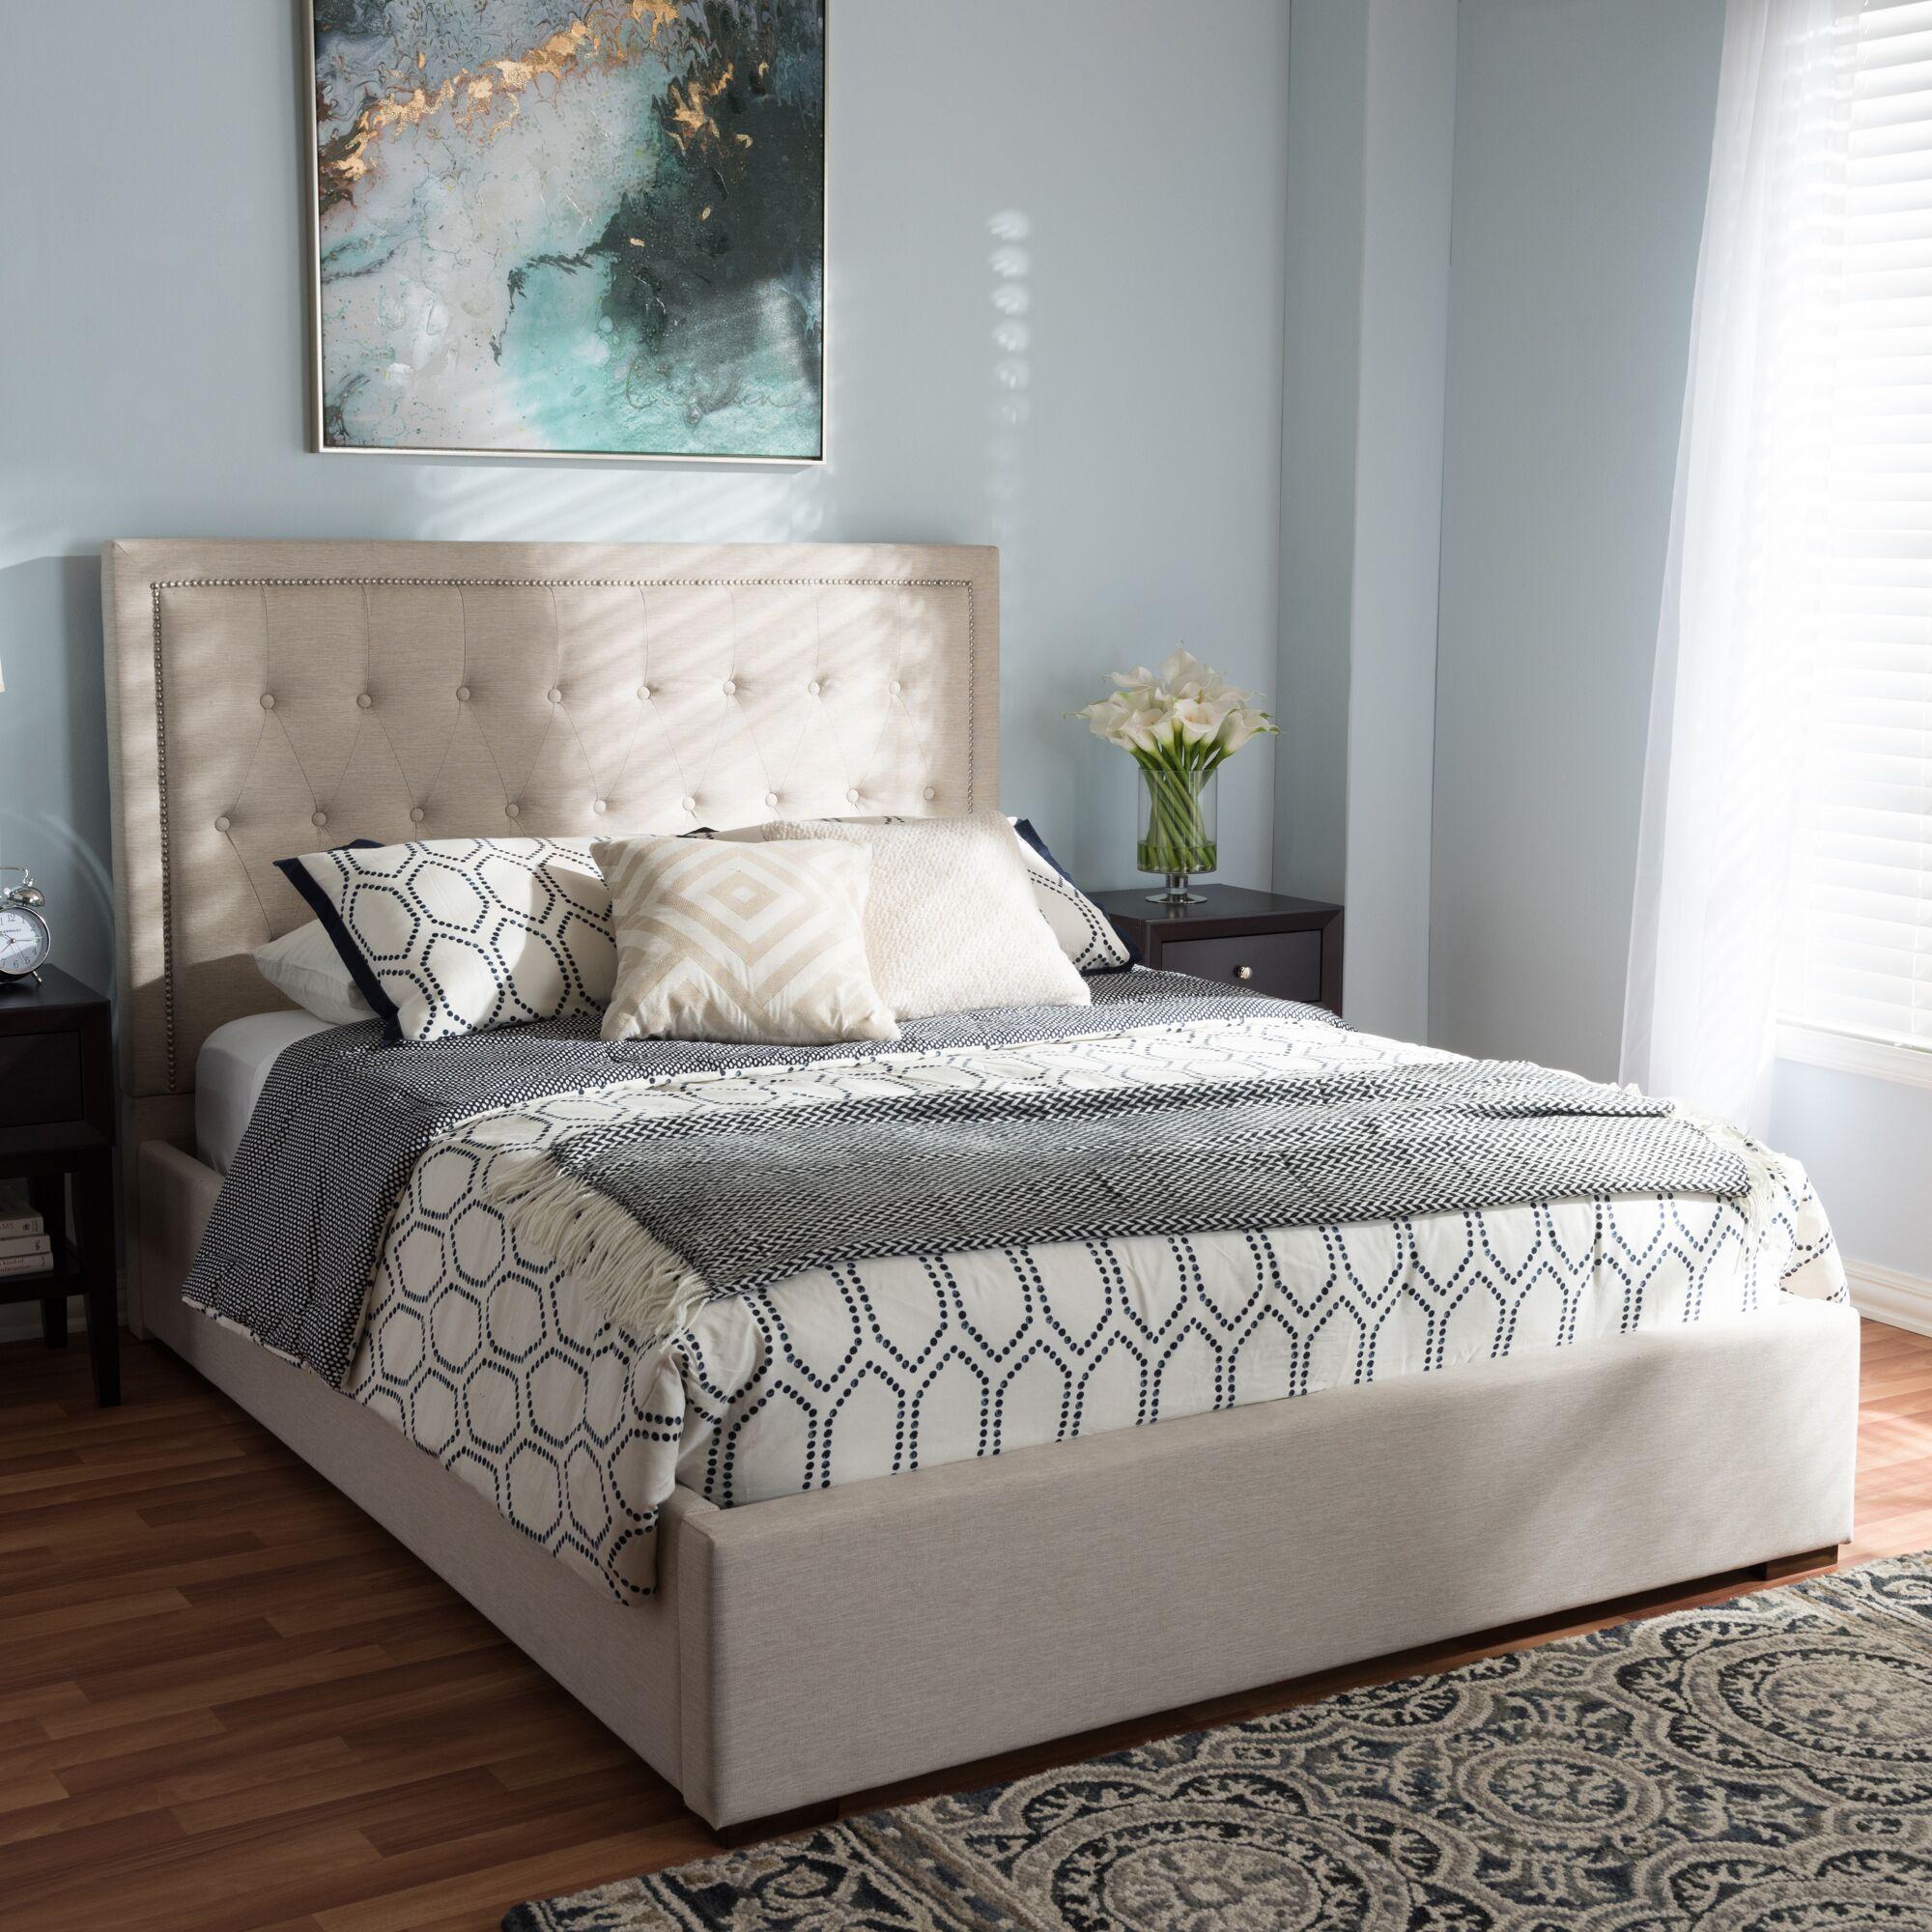 Sedgwick Queen Storage Platform Bed Color: Light Beige